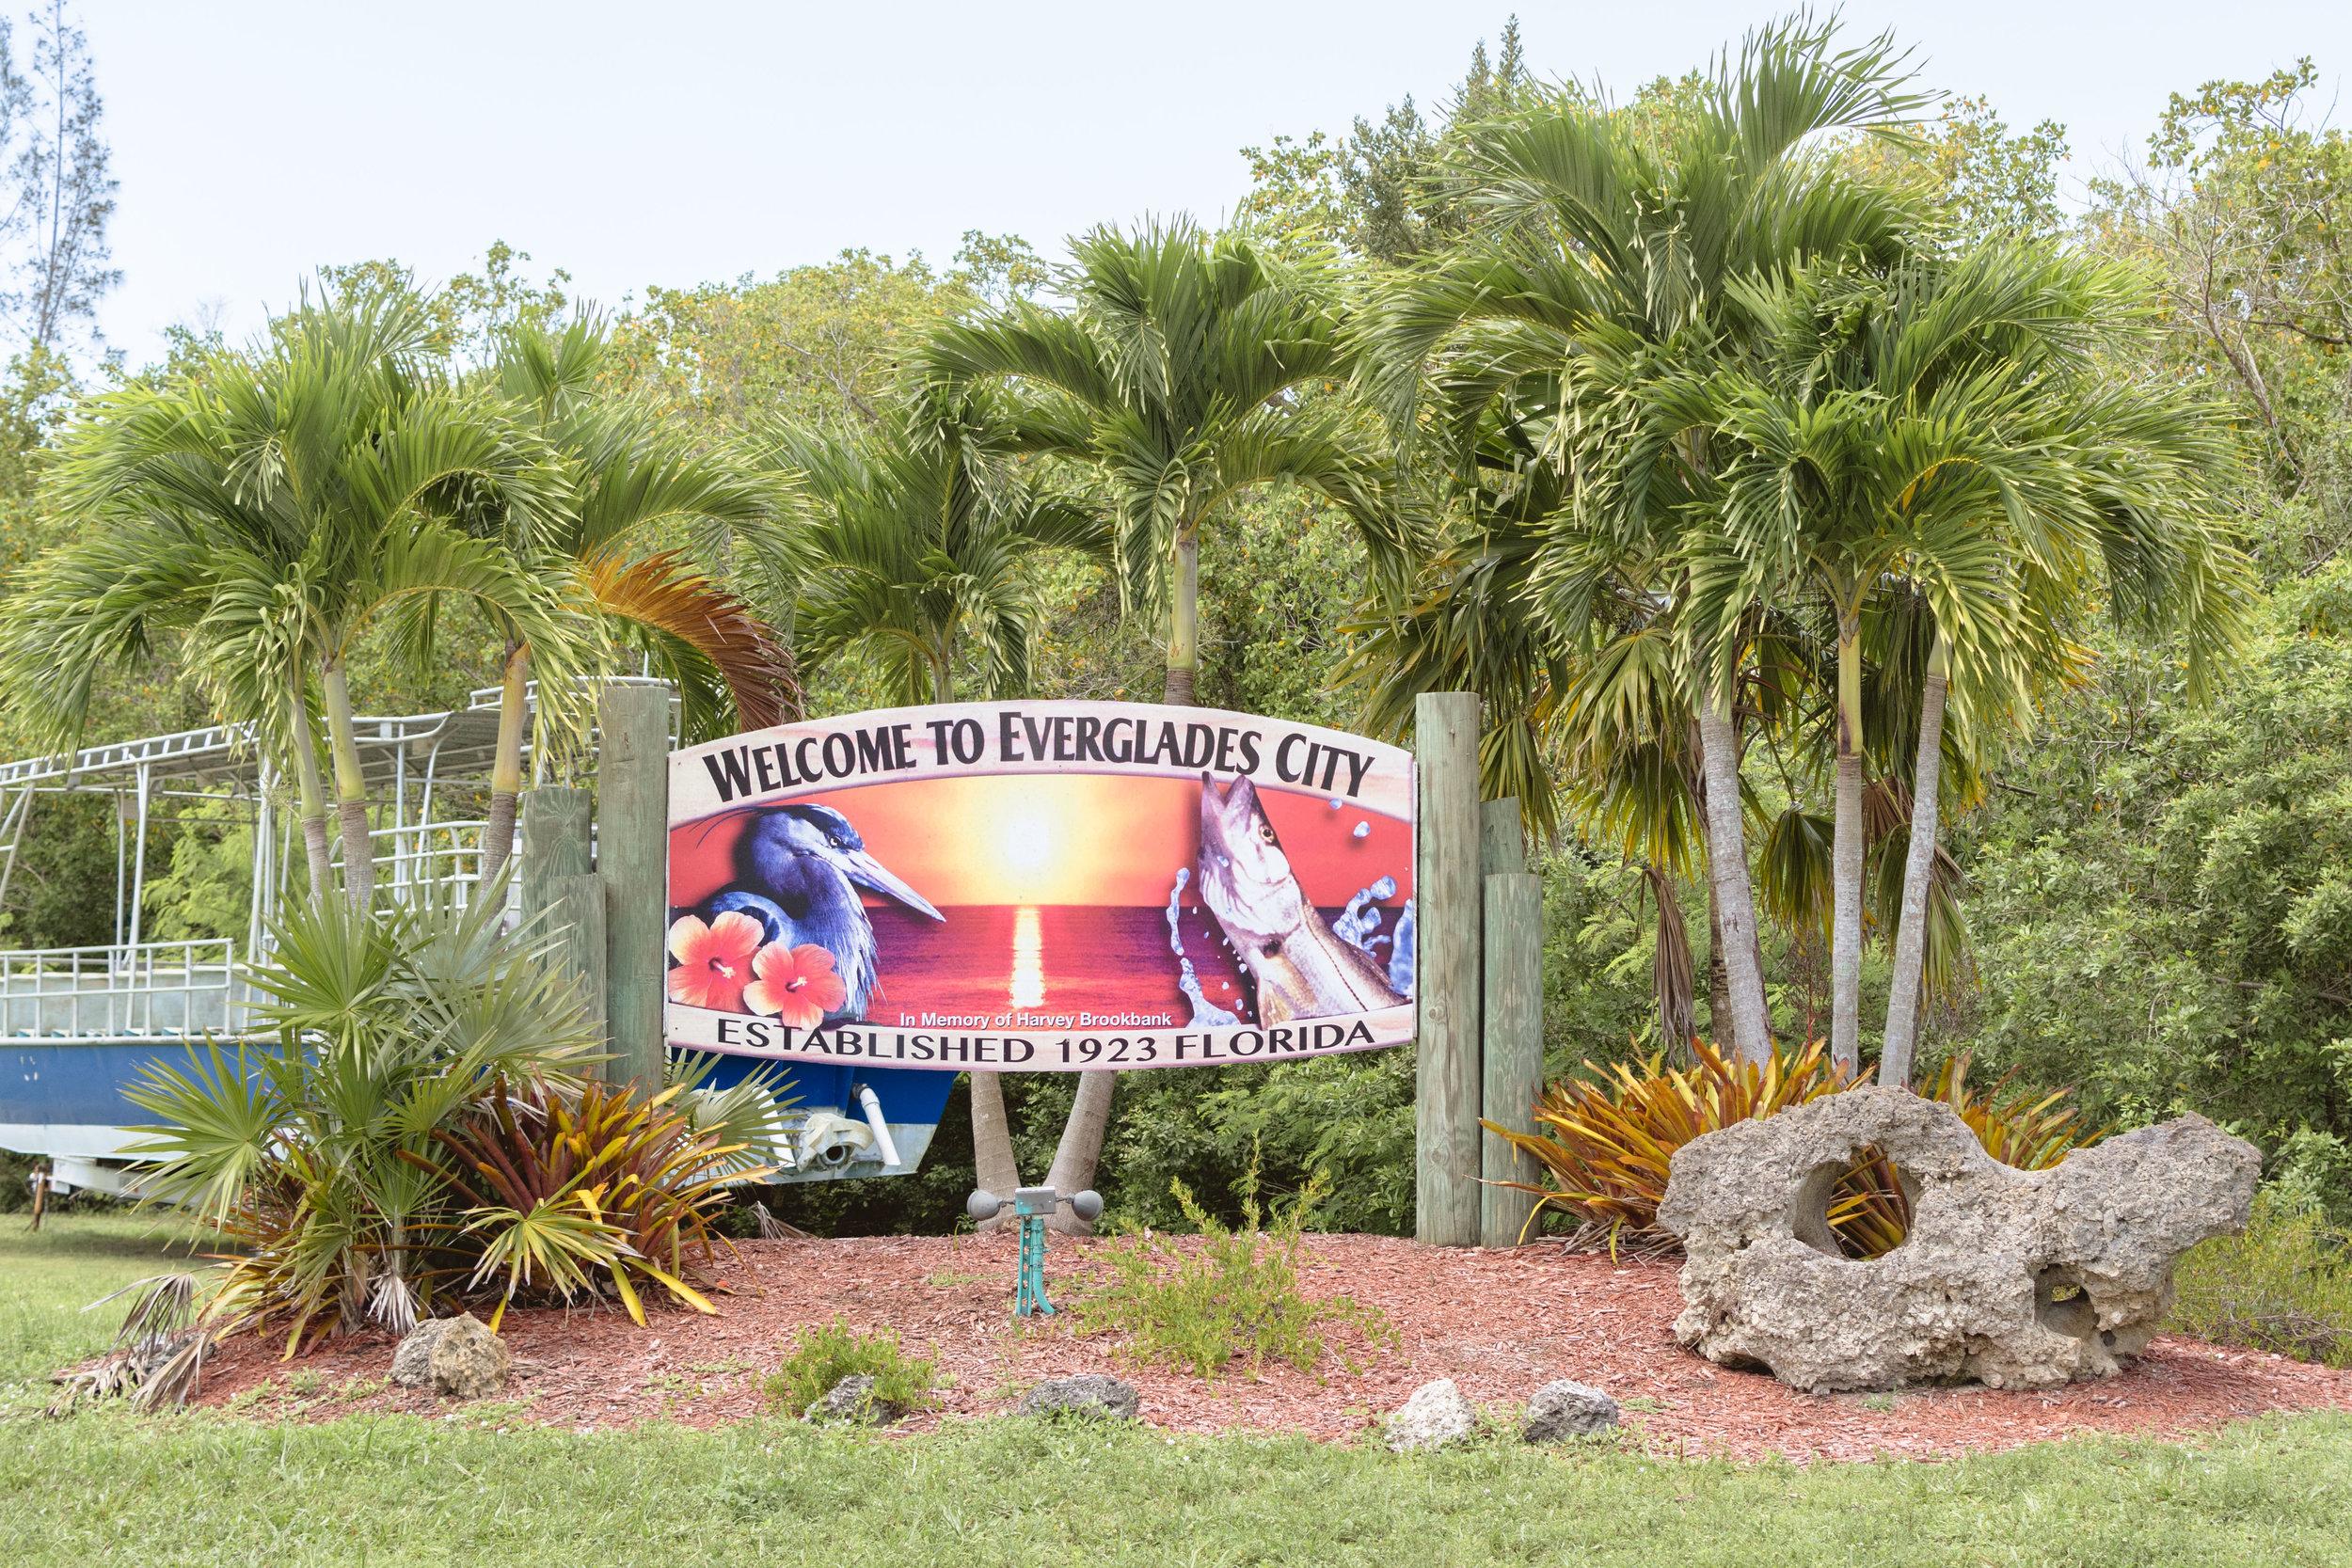 south-west-florida-traveling-to-the-everglades-orlando-travel-photographer-yanitza-ninett-2.jpg